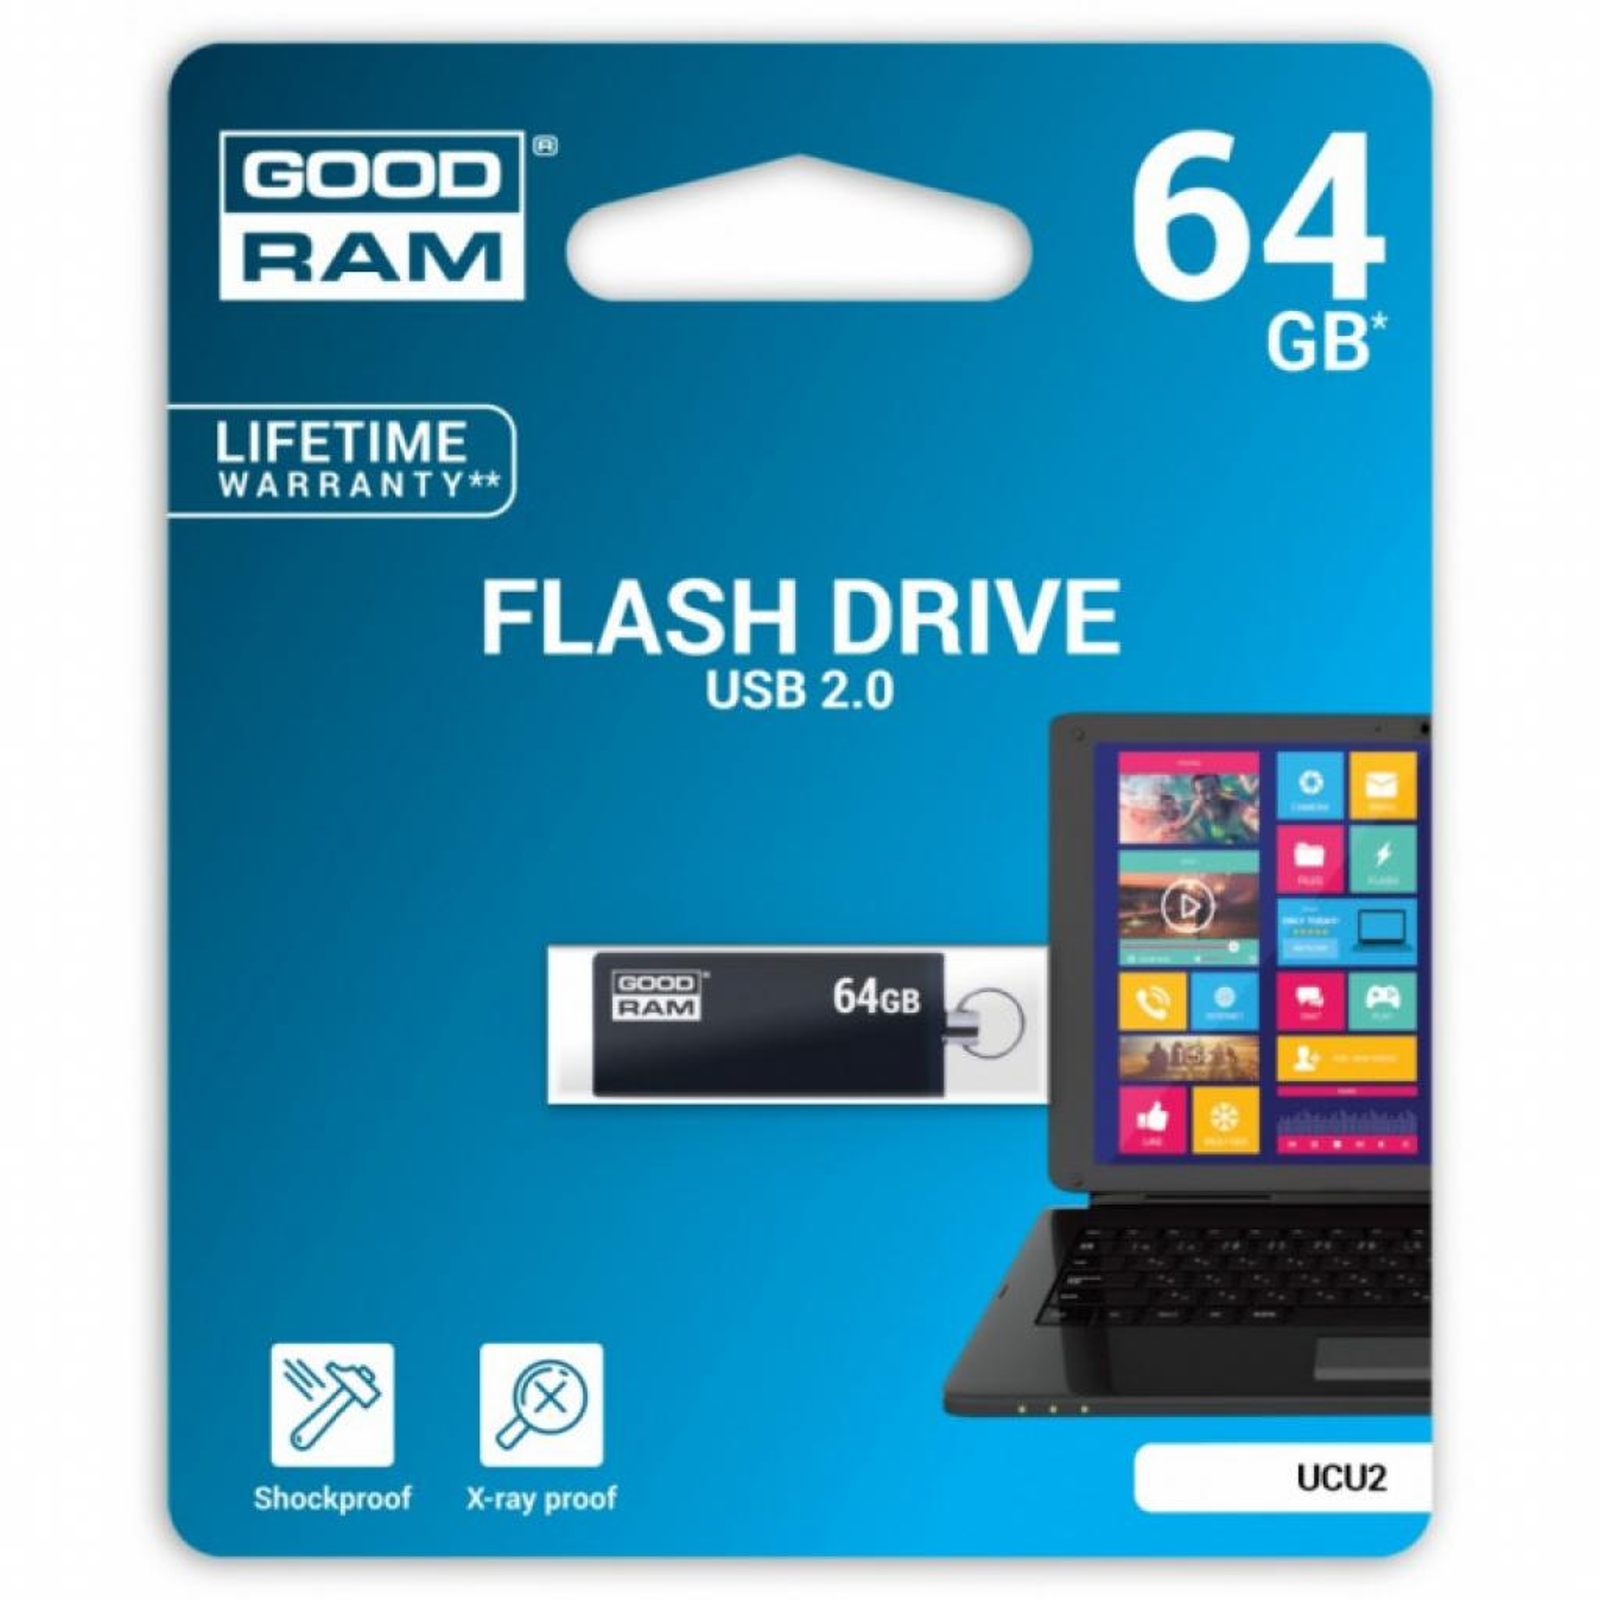 USB флеш накопитель Goodram 32GB Cube Silver USB 2.0 (PD32GH2GRCUSR9) изображение 3